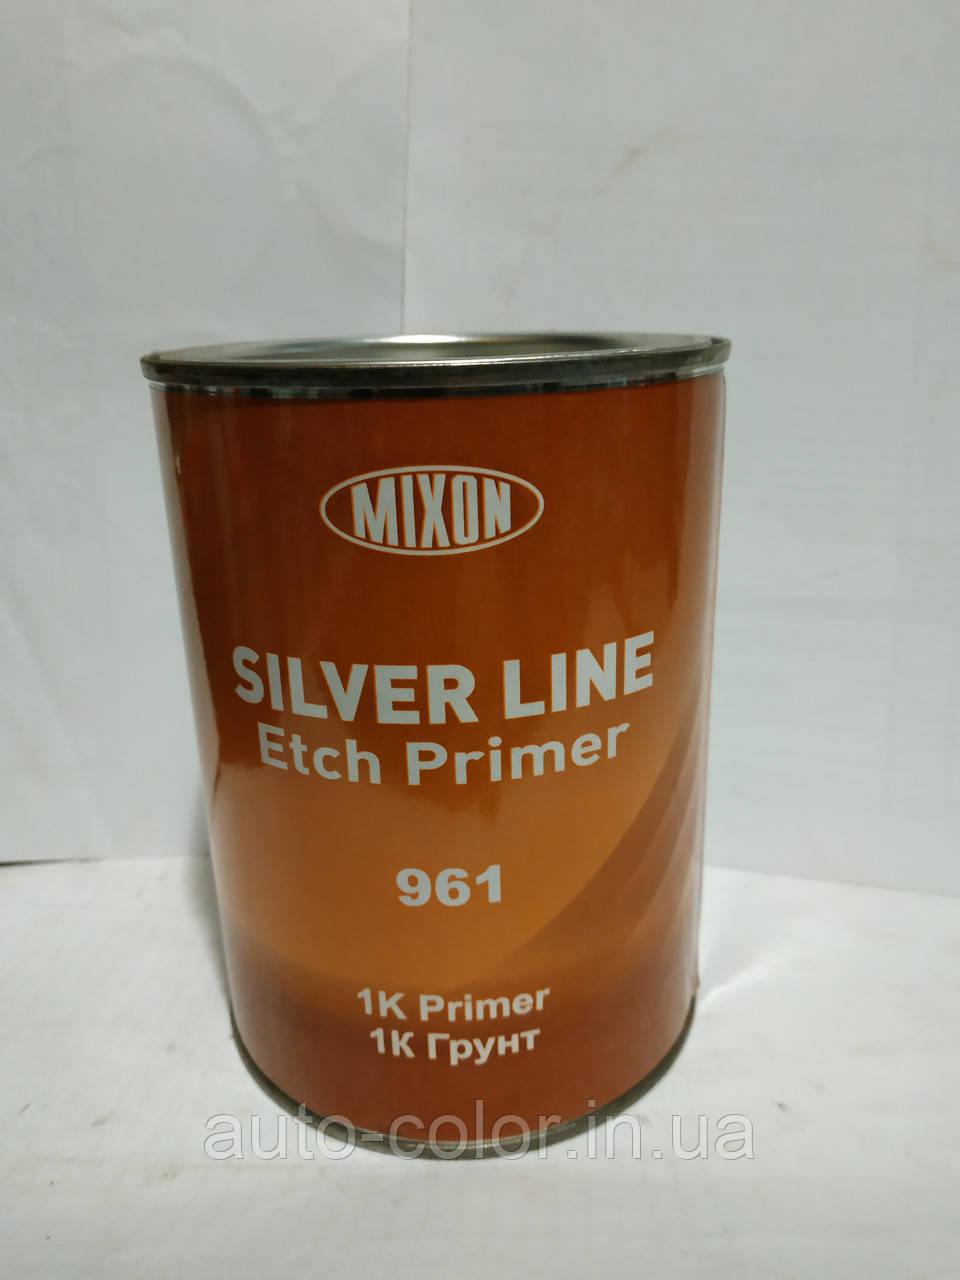 Грунт 1K (Праймер) автомобильный Silver Line 961